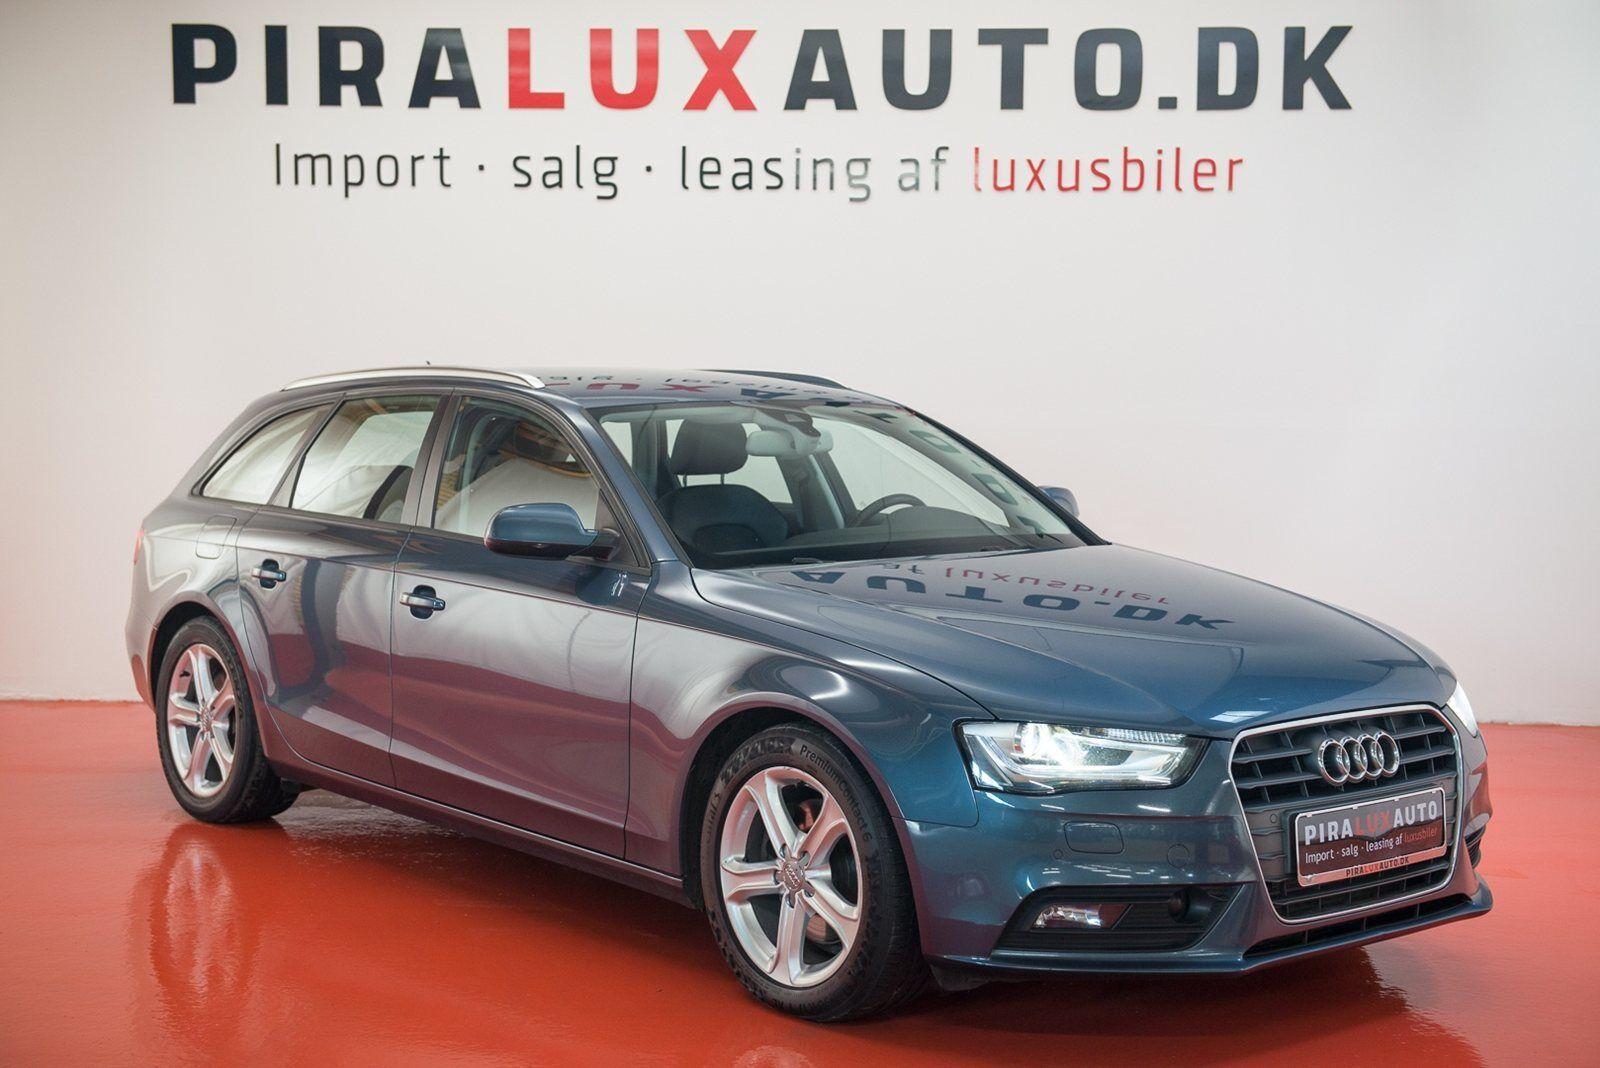 Audi A4 2,0 TDi 150 Avant Multitr. 5d - 263.900 kr.